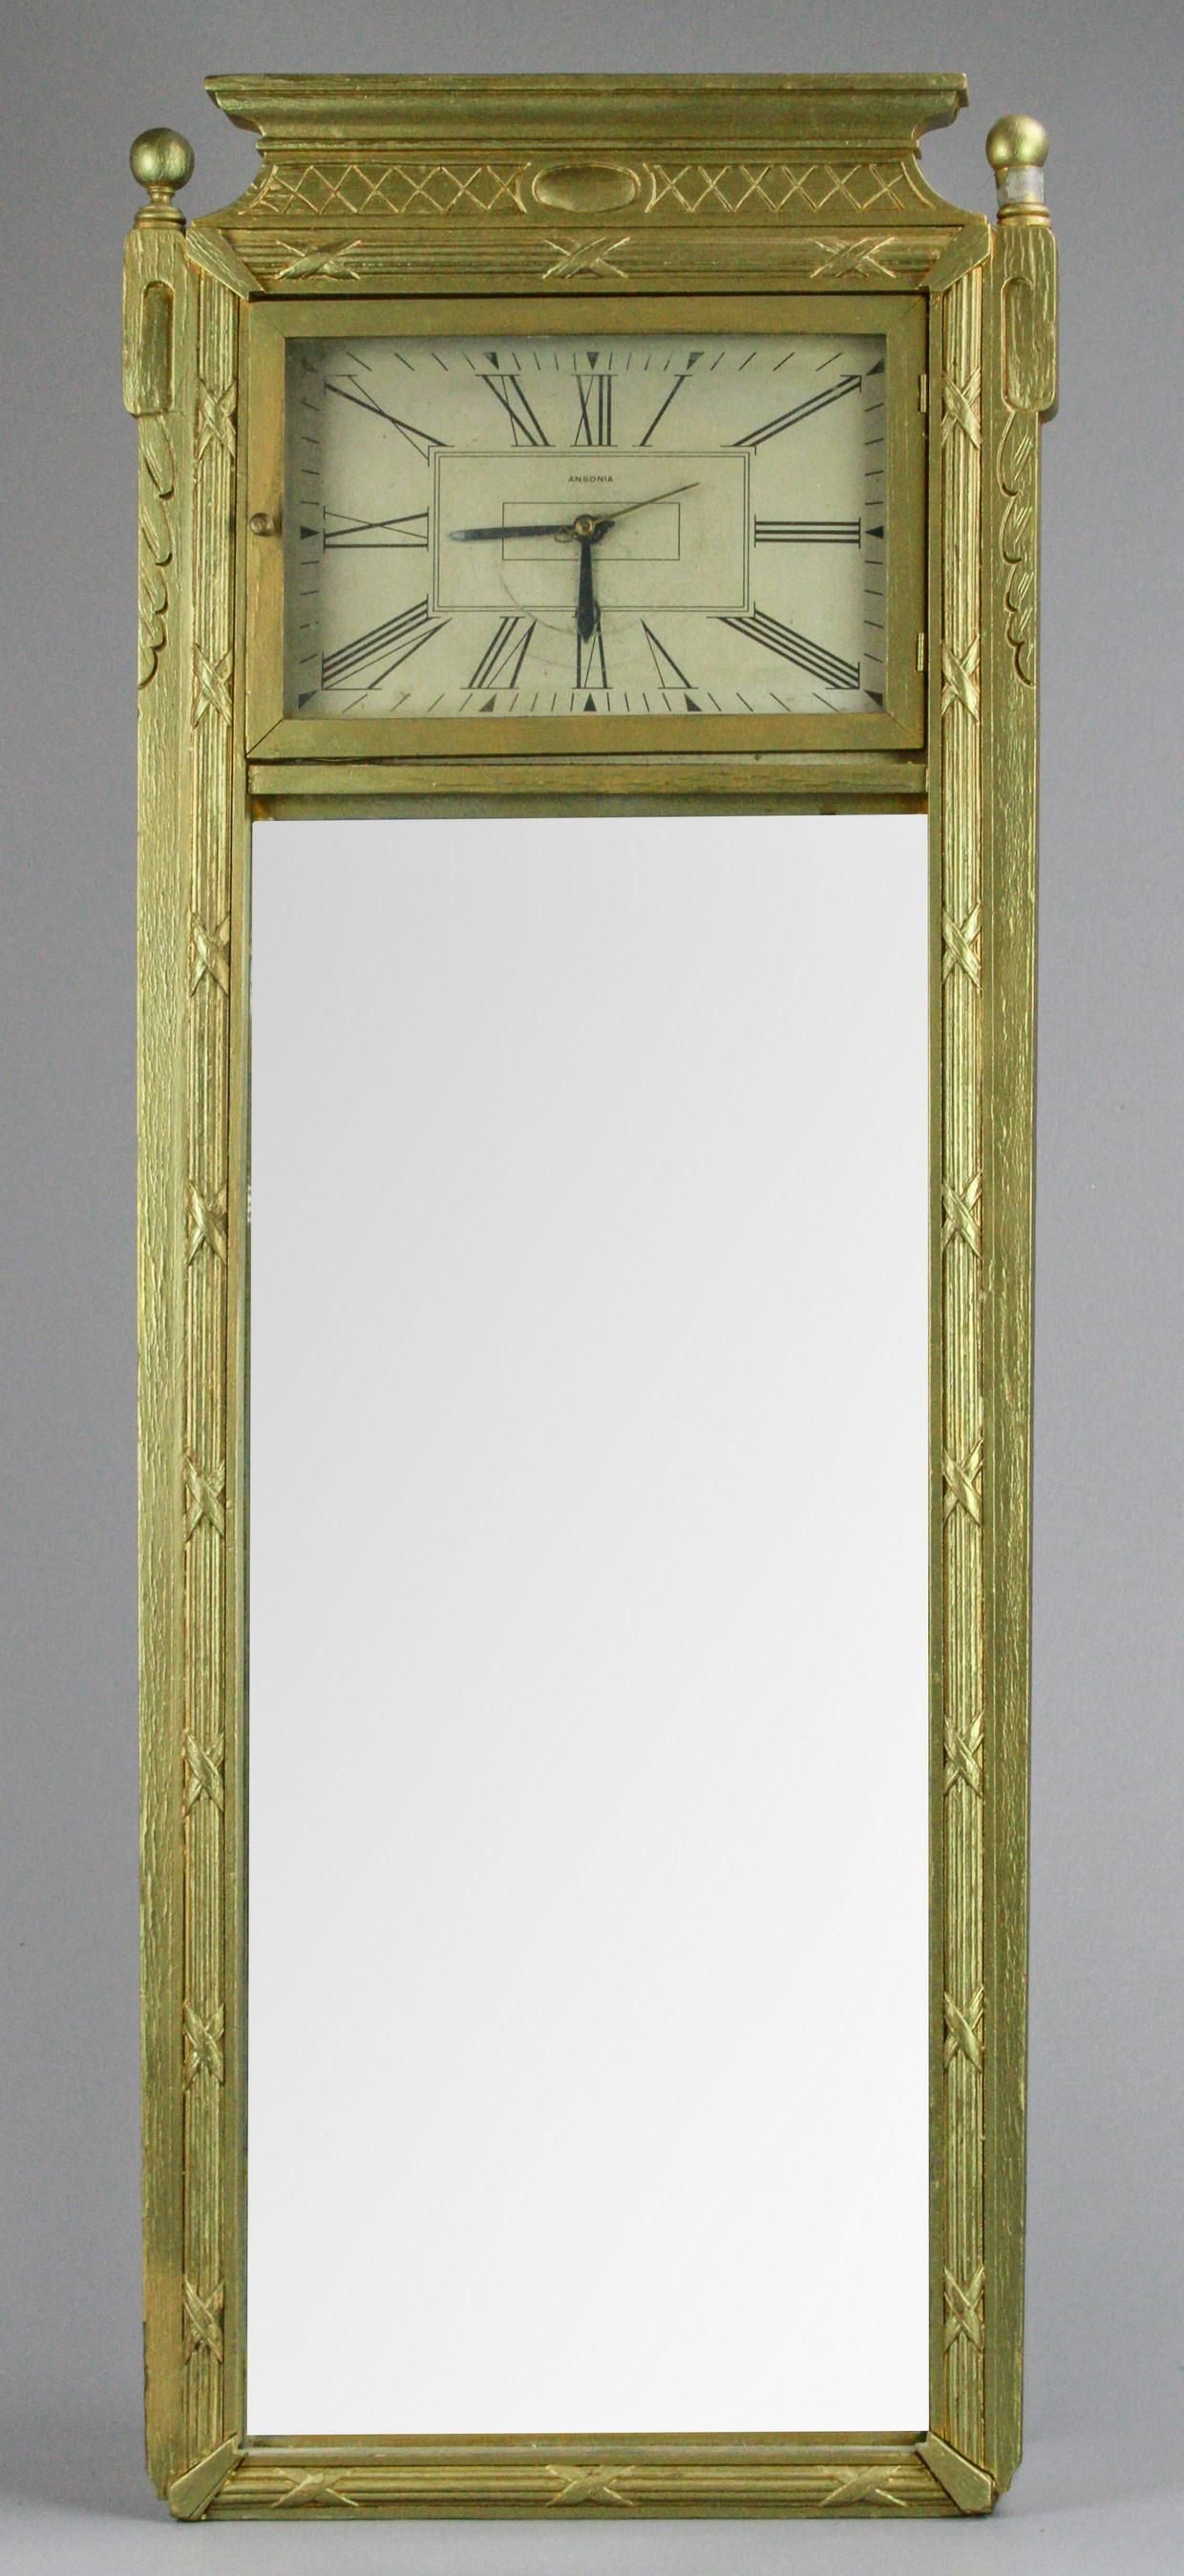 Ansonia Waltham Art Deco Wall Clock with Mirror